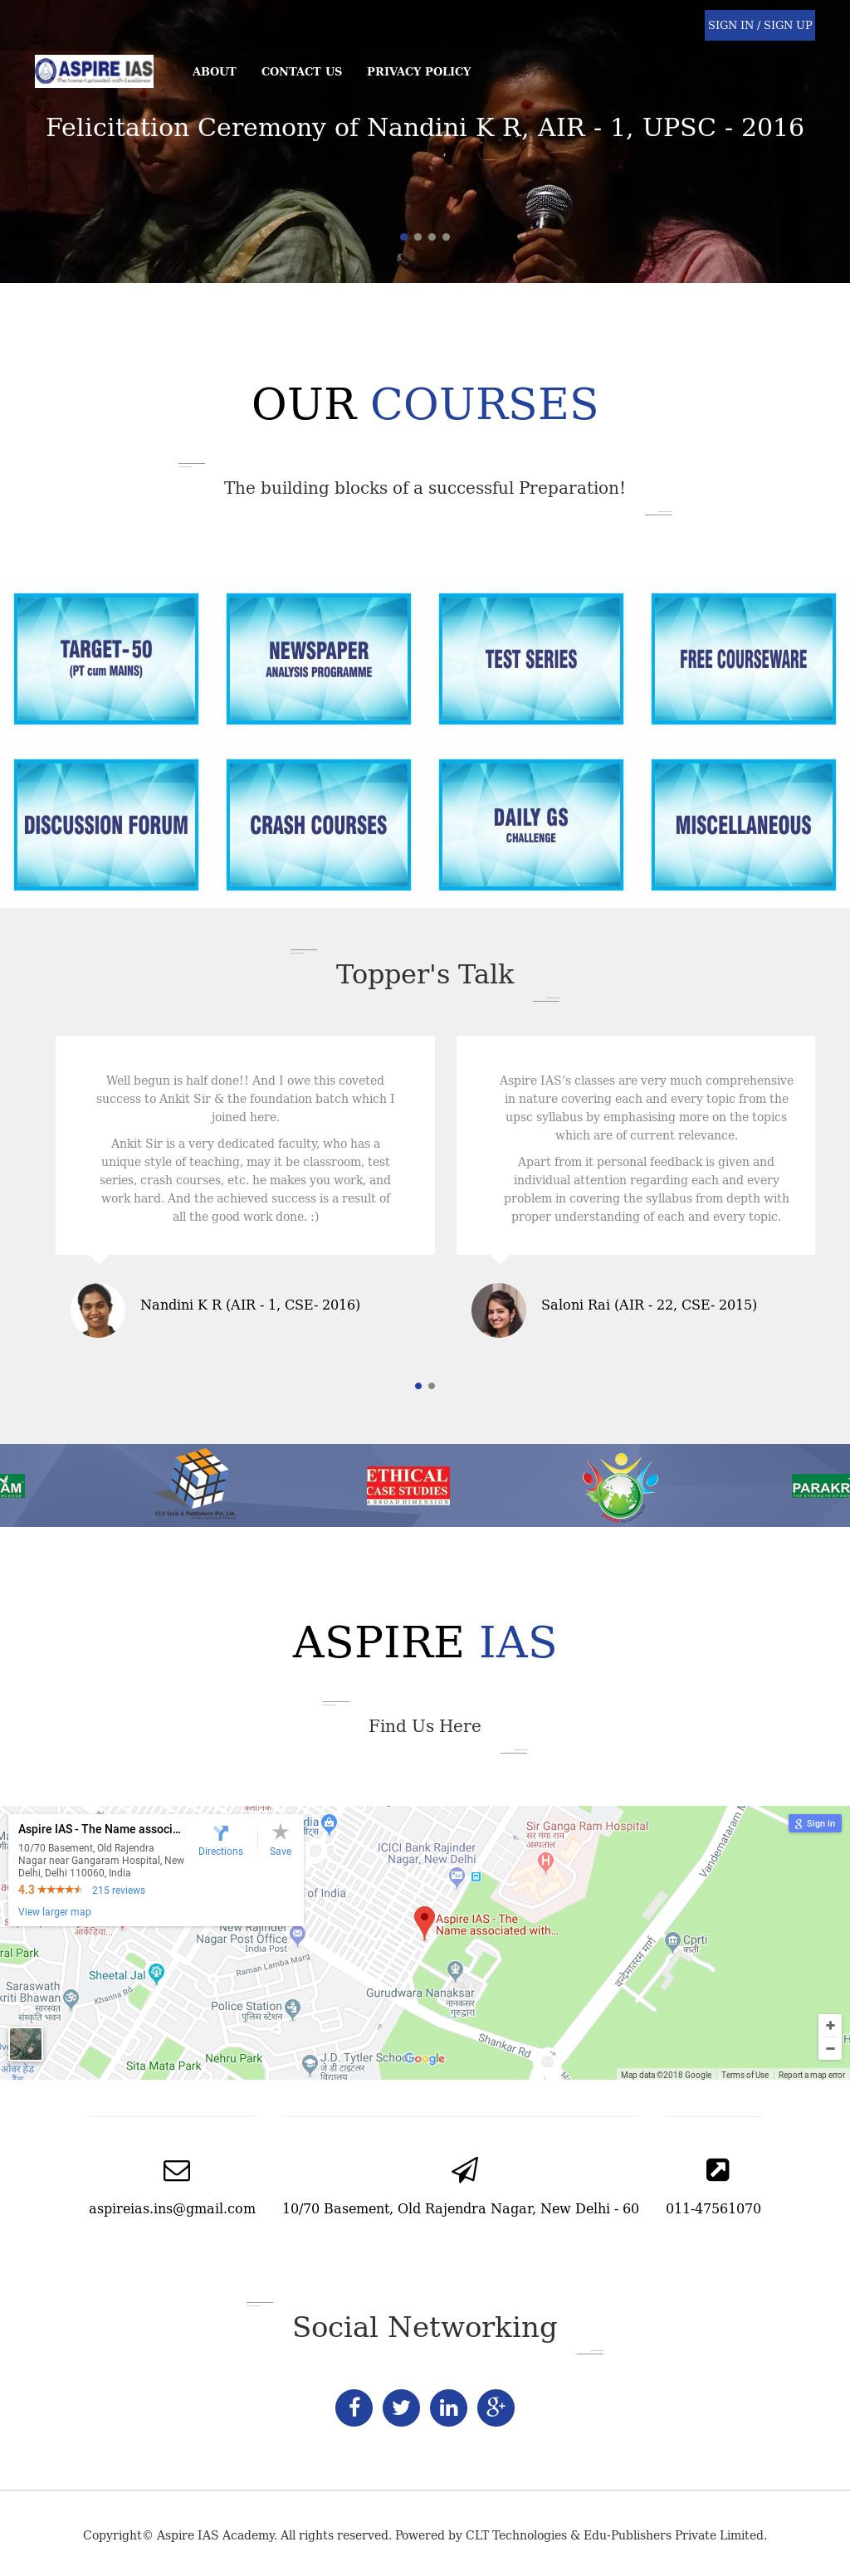 Aspireias Competitors, Revenue and Employees - Owler Company